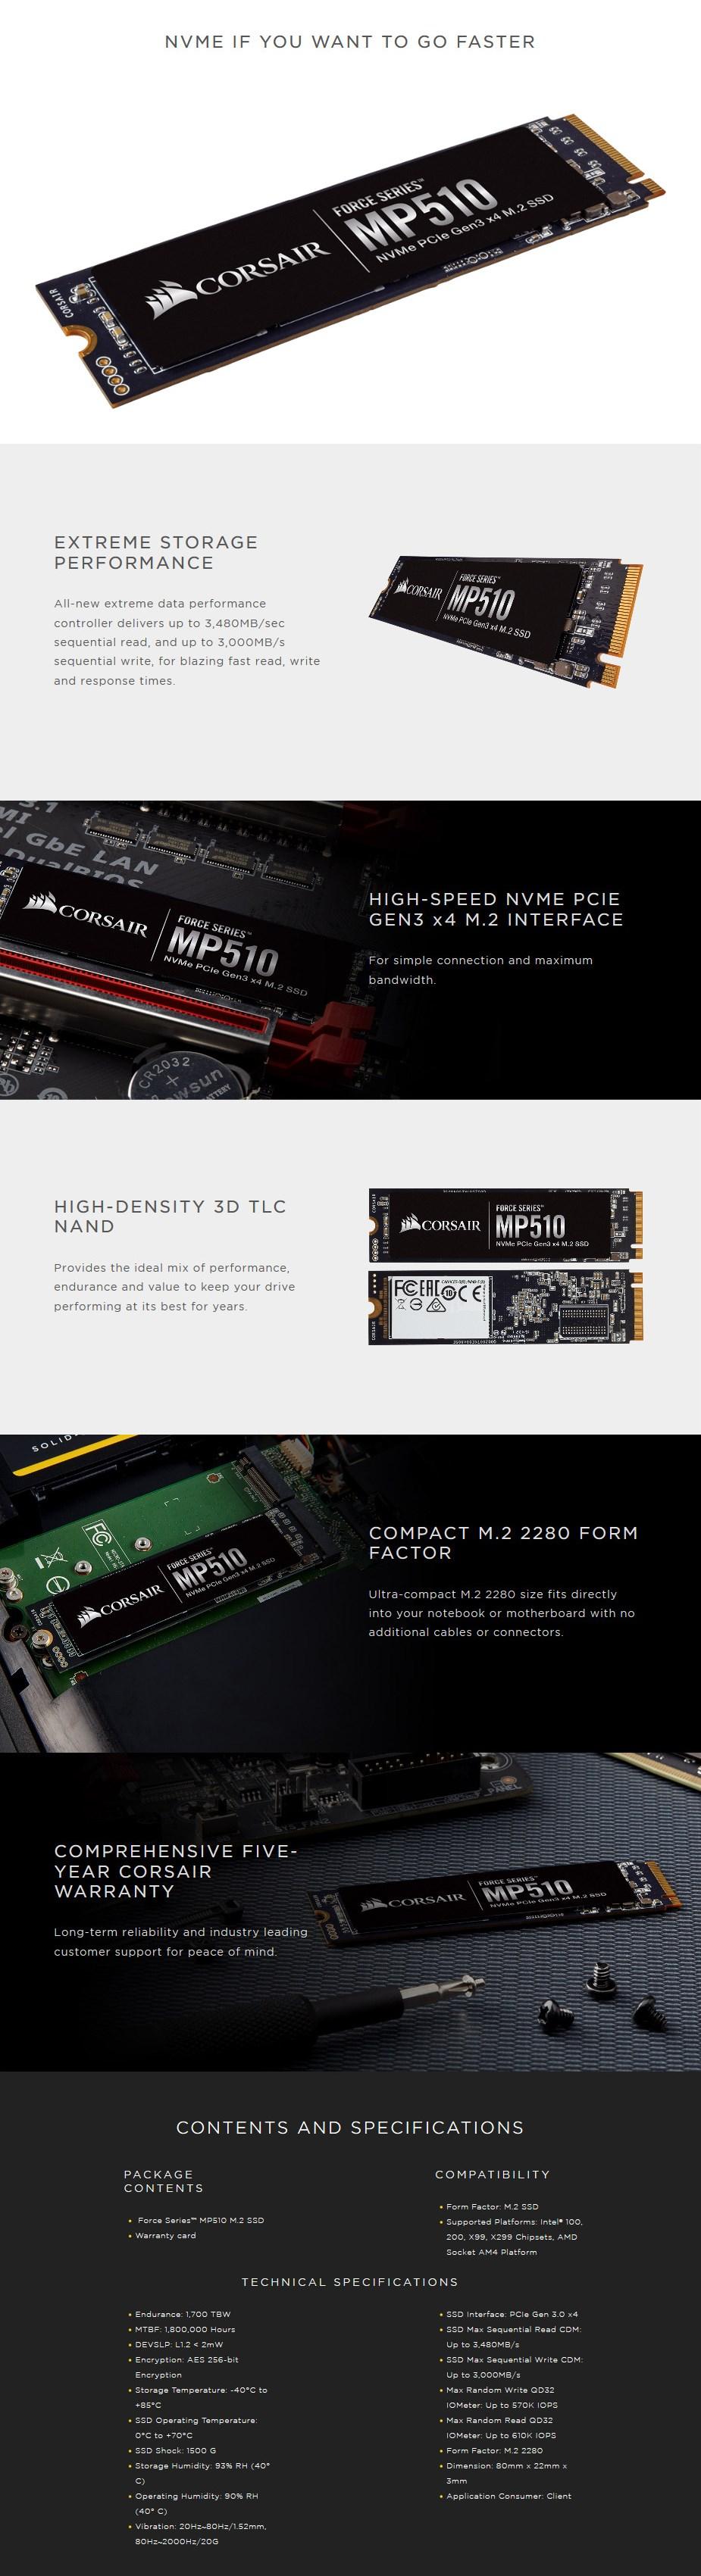 Corsair Force MP510 960GB M.2 NVMe SSD CSSD-F960GBMP510 - Desktop Overview 1